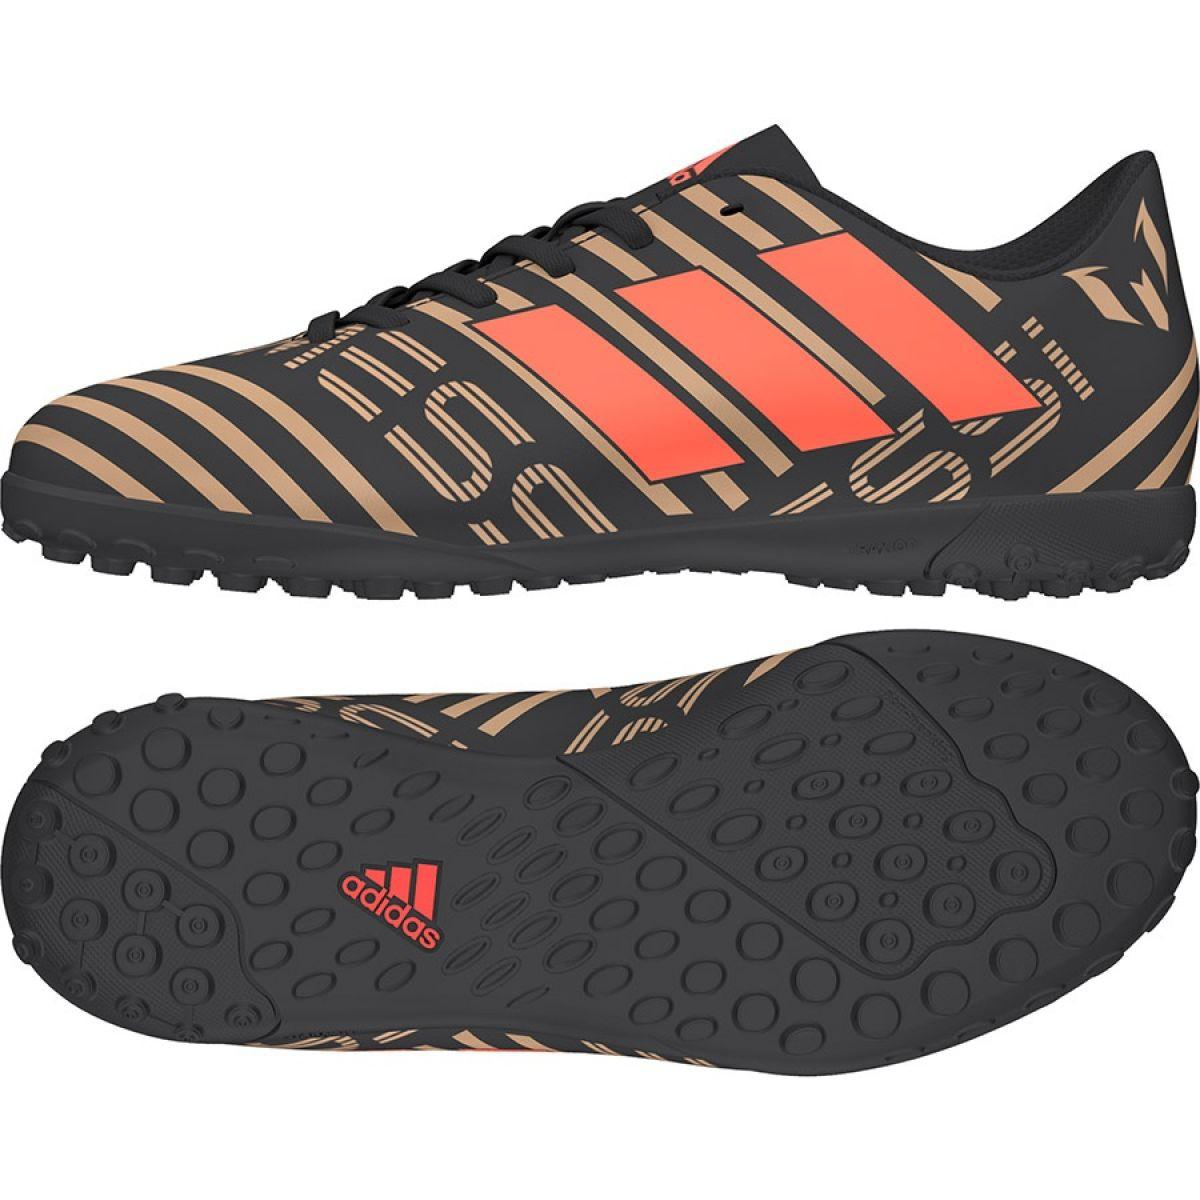 Momento Más Empresa  Adidas Nemeziz Messi Tango 17.4 Tf Jr CP9217 Football Boots black -  ButyModne.pl